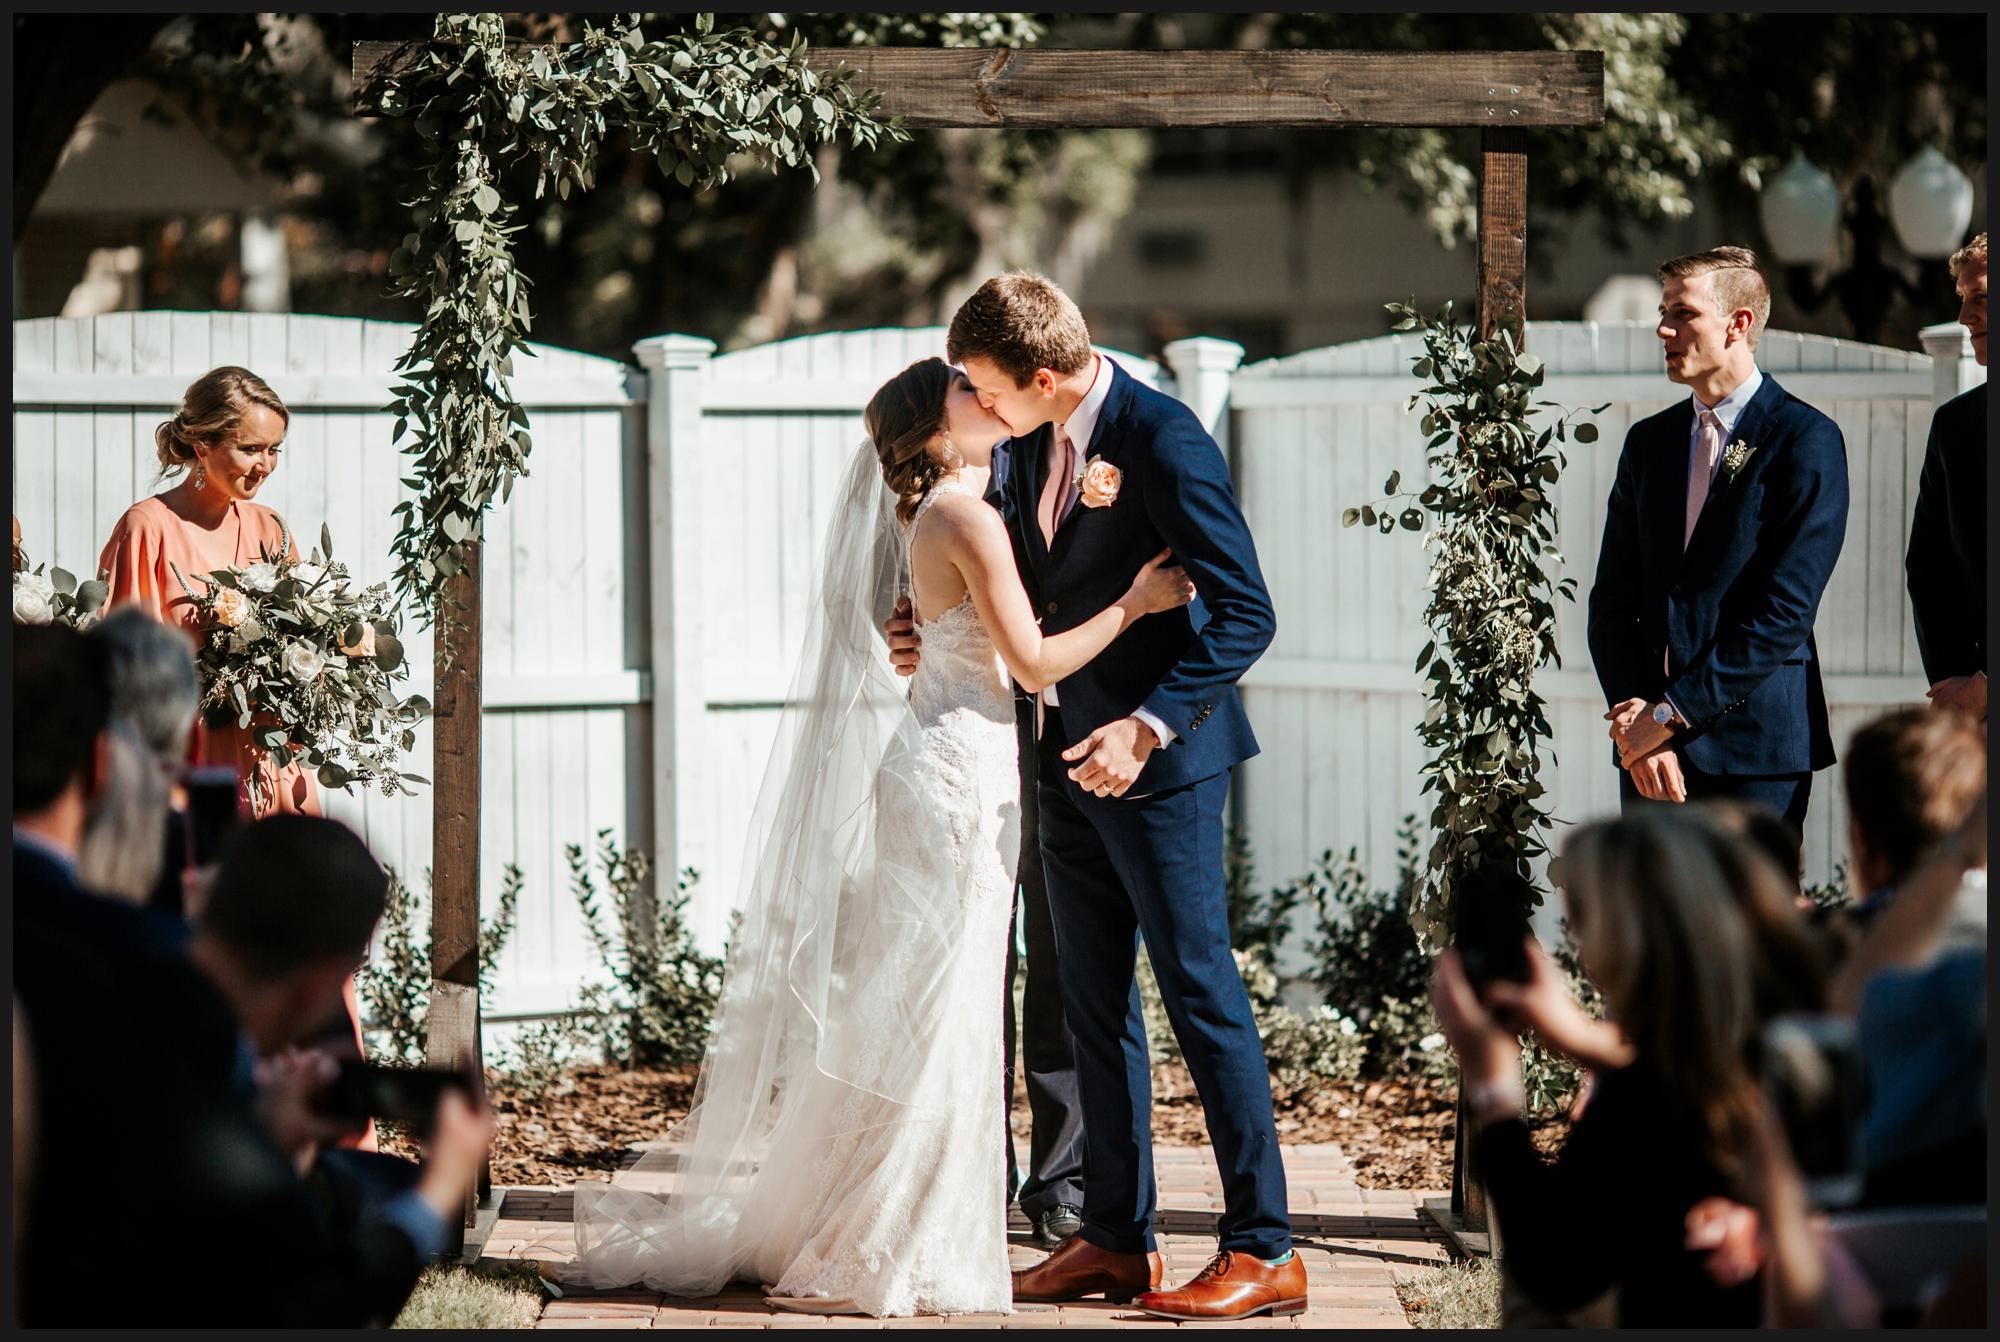 Orlando-Wedding-Photographer-destination-wedding-photographer-florida-wedding-photographer-bohemian-wedding-photographer_1751.jpg